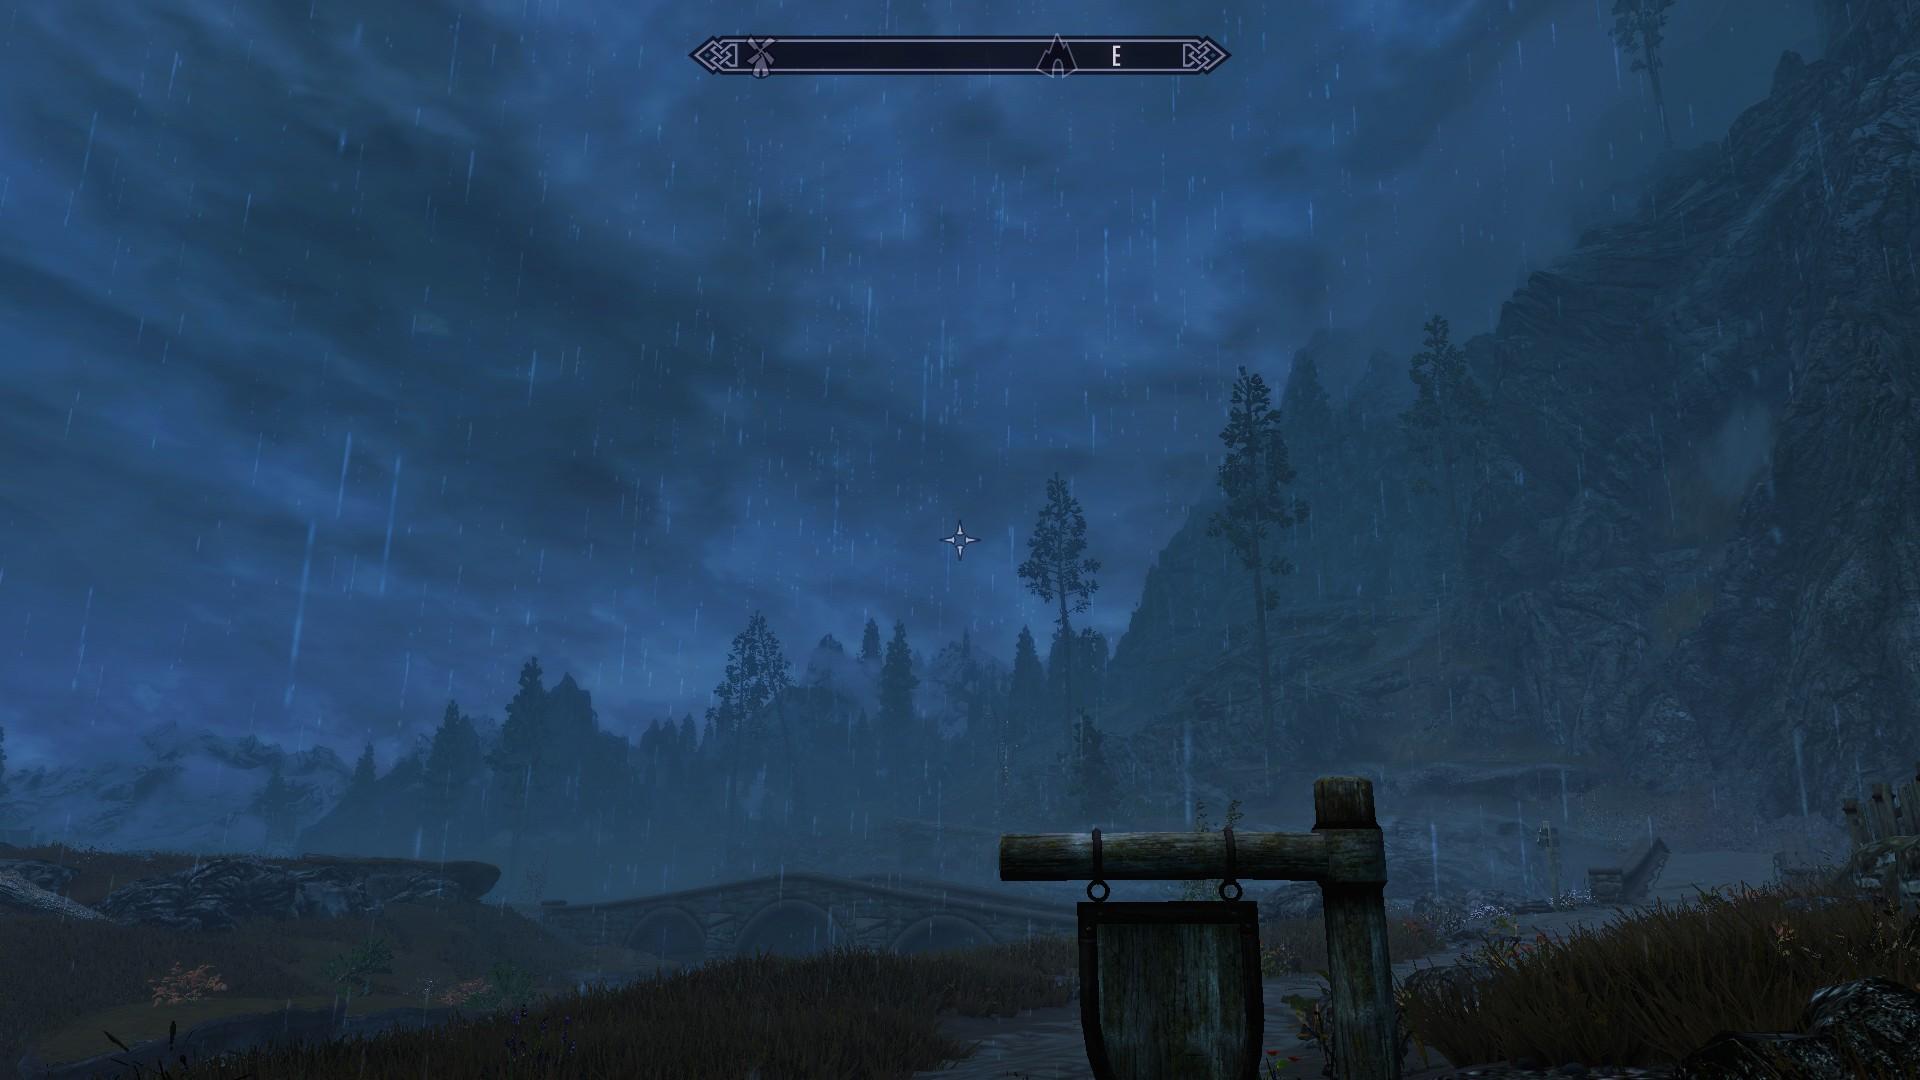 20180311213724_1.jpg - Elder Scrolls 5: Skyrim, the